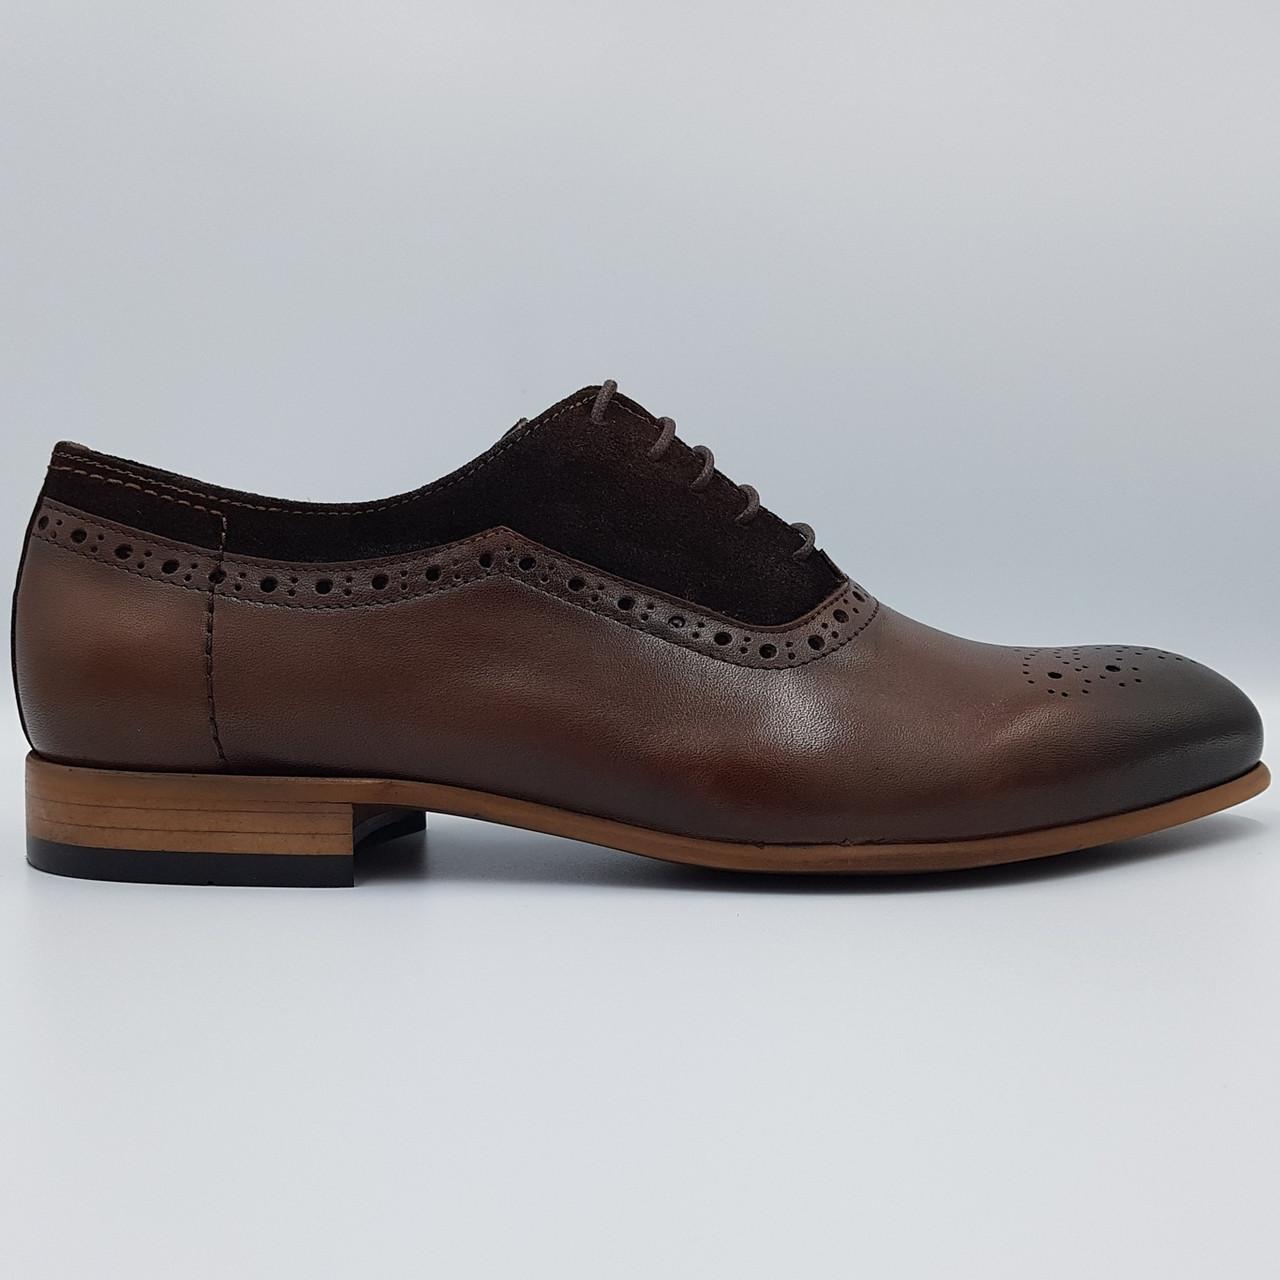 Мужские туфли оксфорды Luciano Bellini коричневые SH0046/46